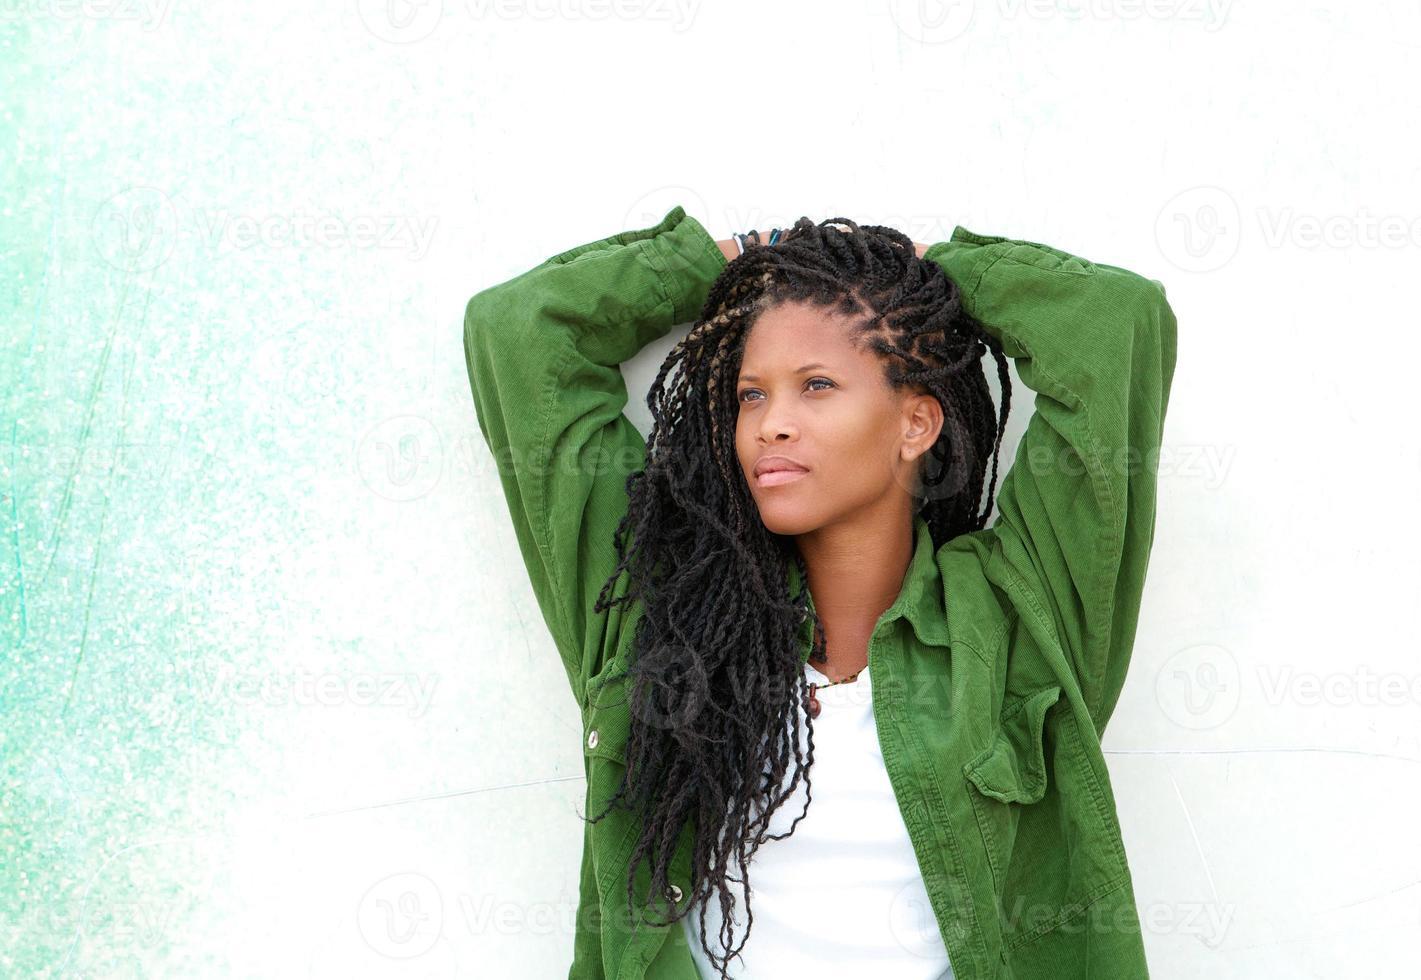 joven mujer negra relajante al aire libre foto